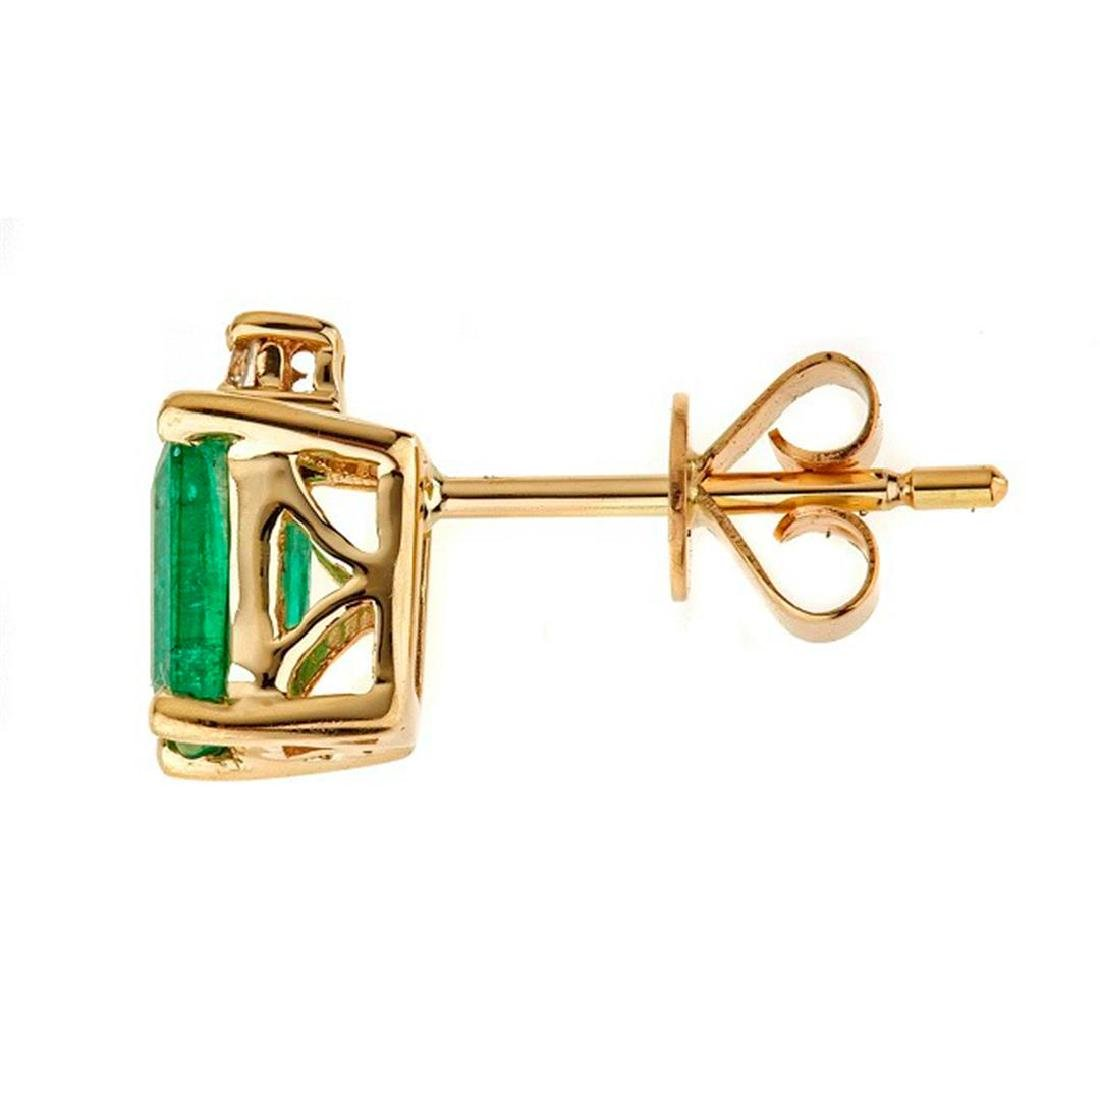 1.13 ctw Emerald and Diamond Earrings - 14KT Yellow - 2